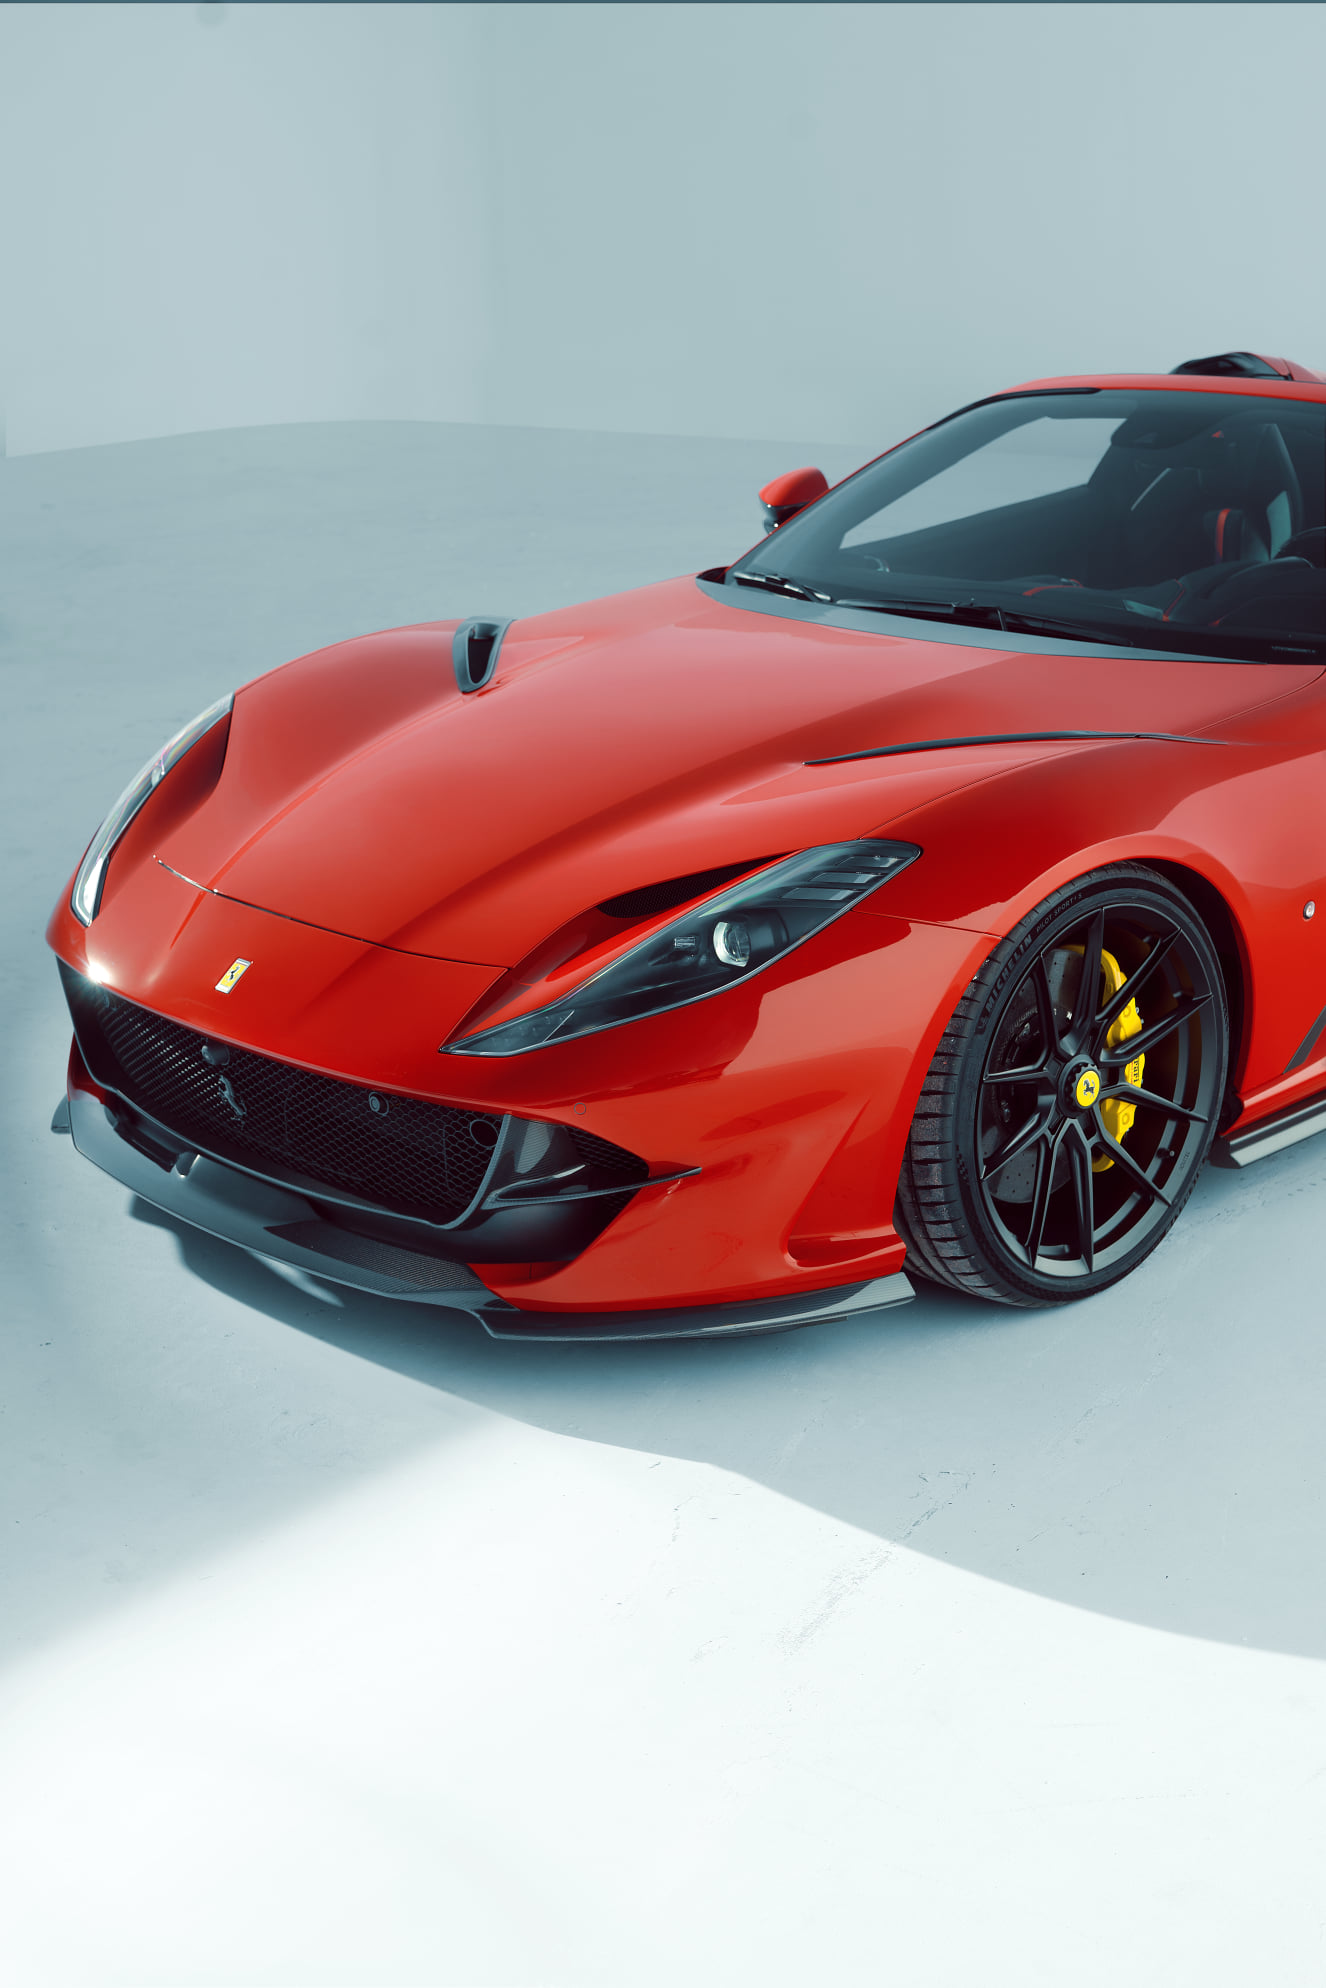 Ferrari-812-GTS-by-Novitec-9